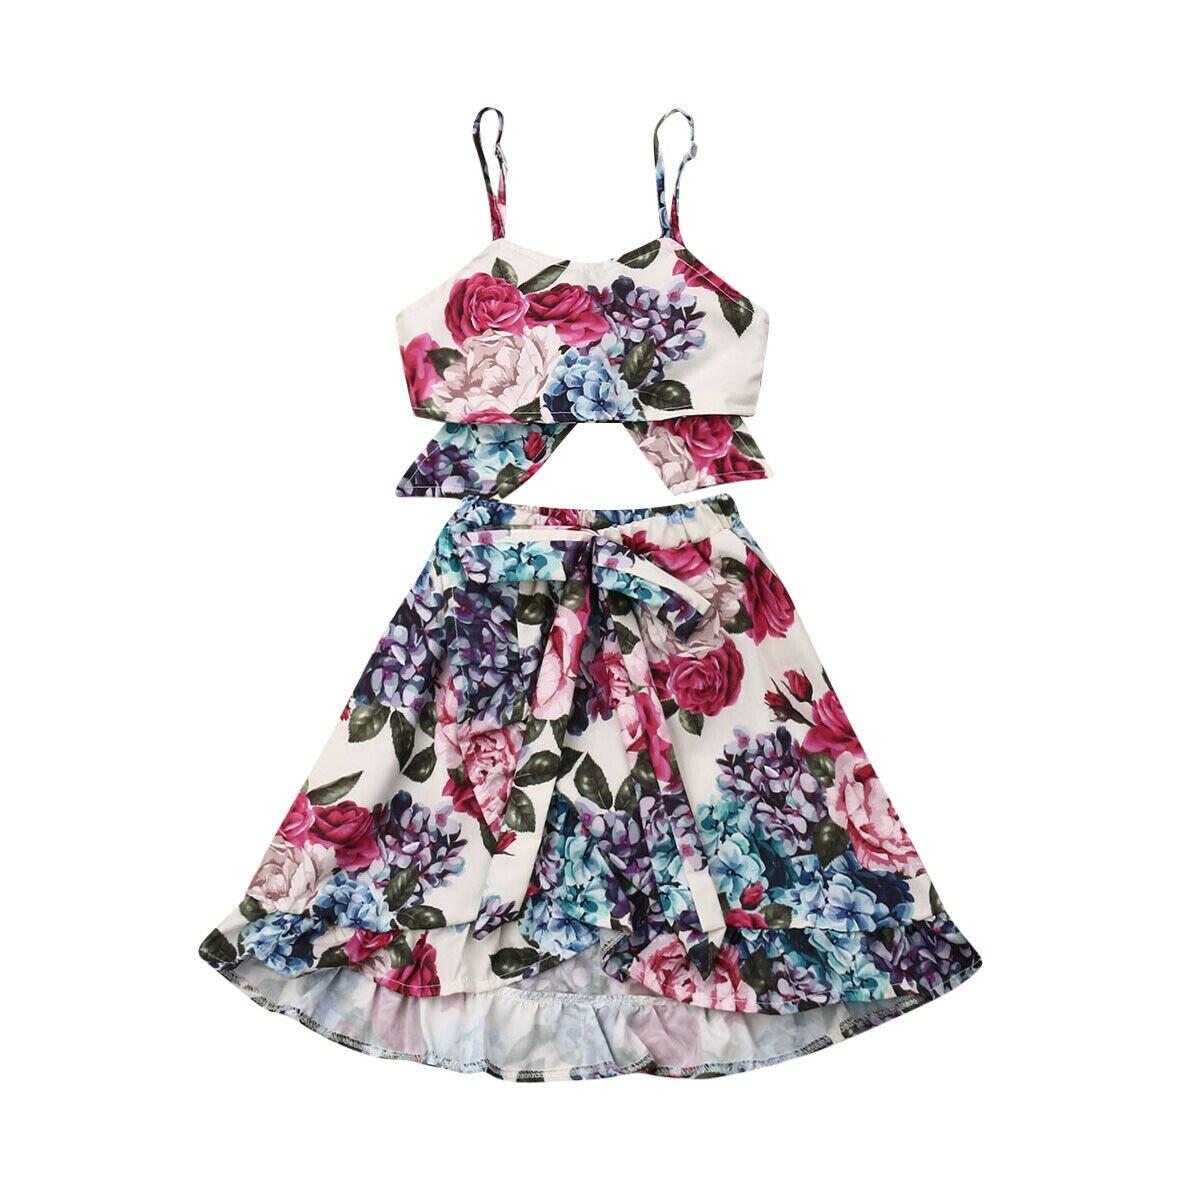 1-6Y Summer Toddler Kids Baby Girl Floral Strap Crop Tops Long Skirt Bowknot 2PCS Outfits Princess Girls Boho Clothes Set